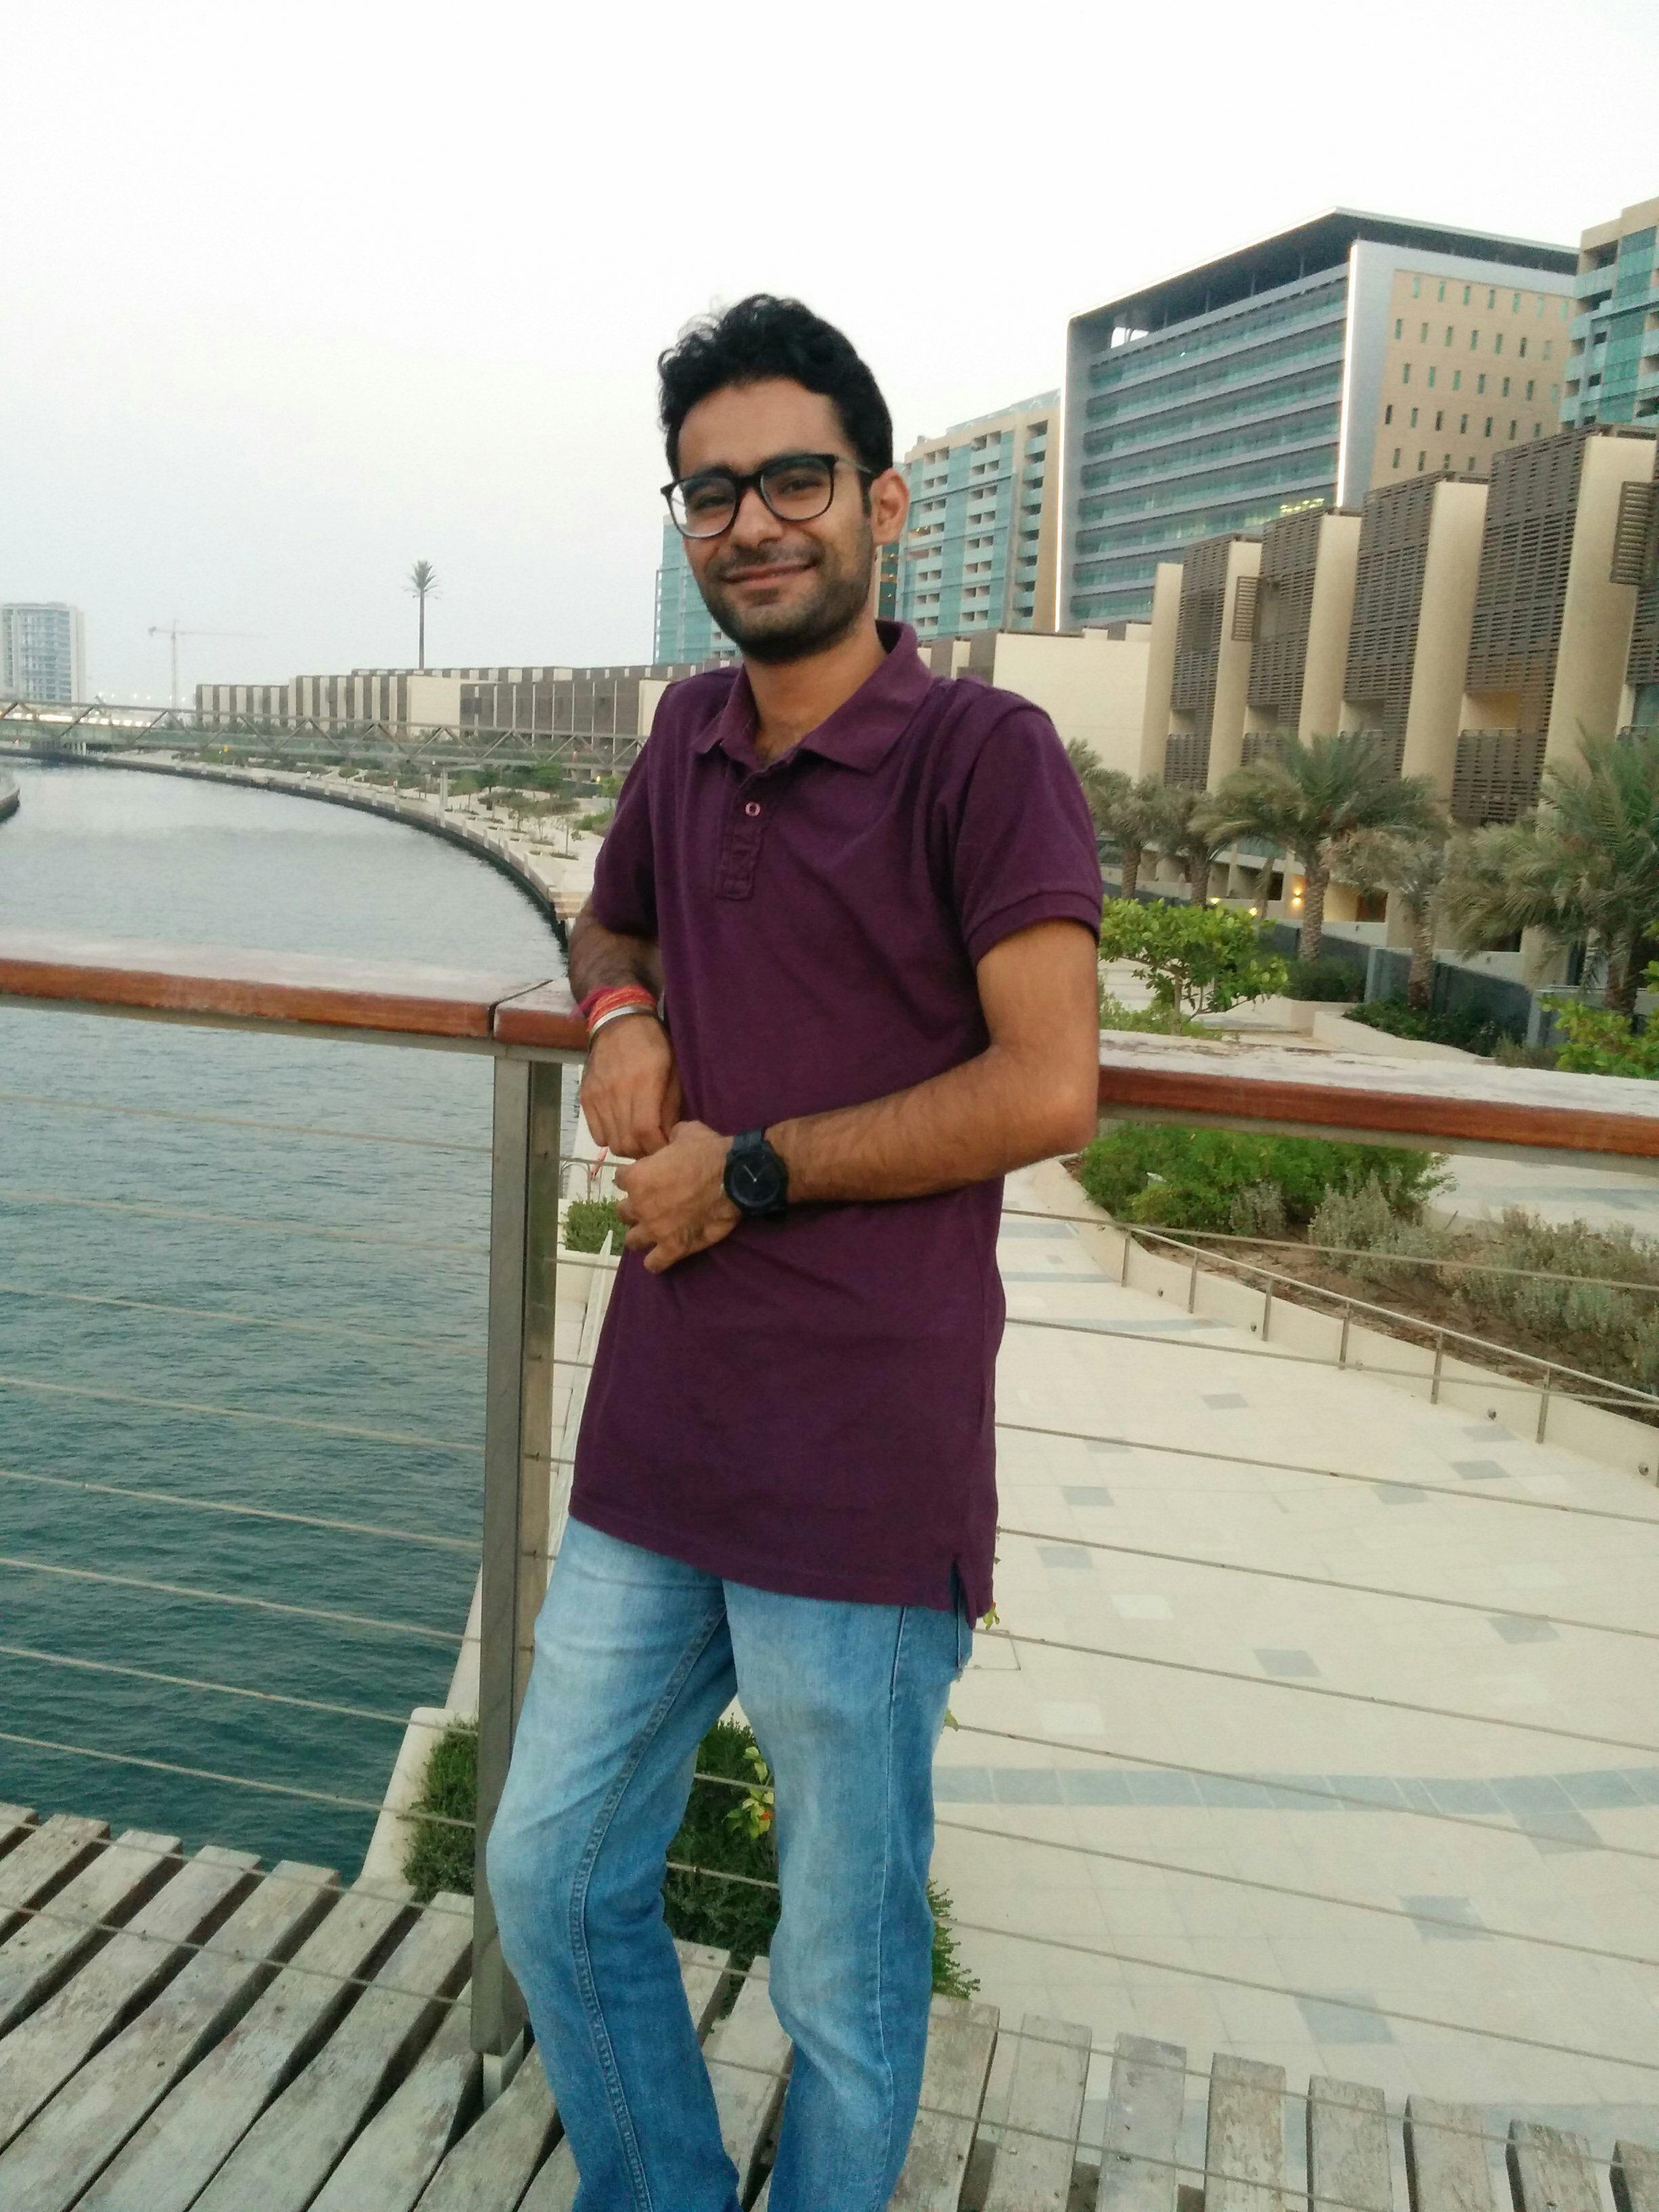 meet ups in abu dhabi